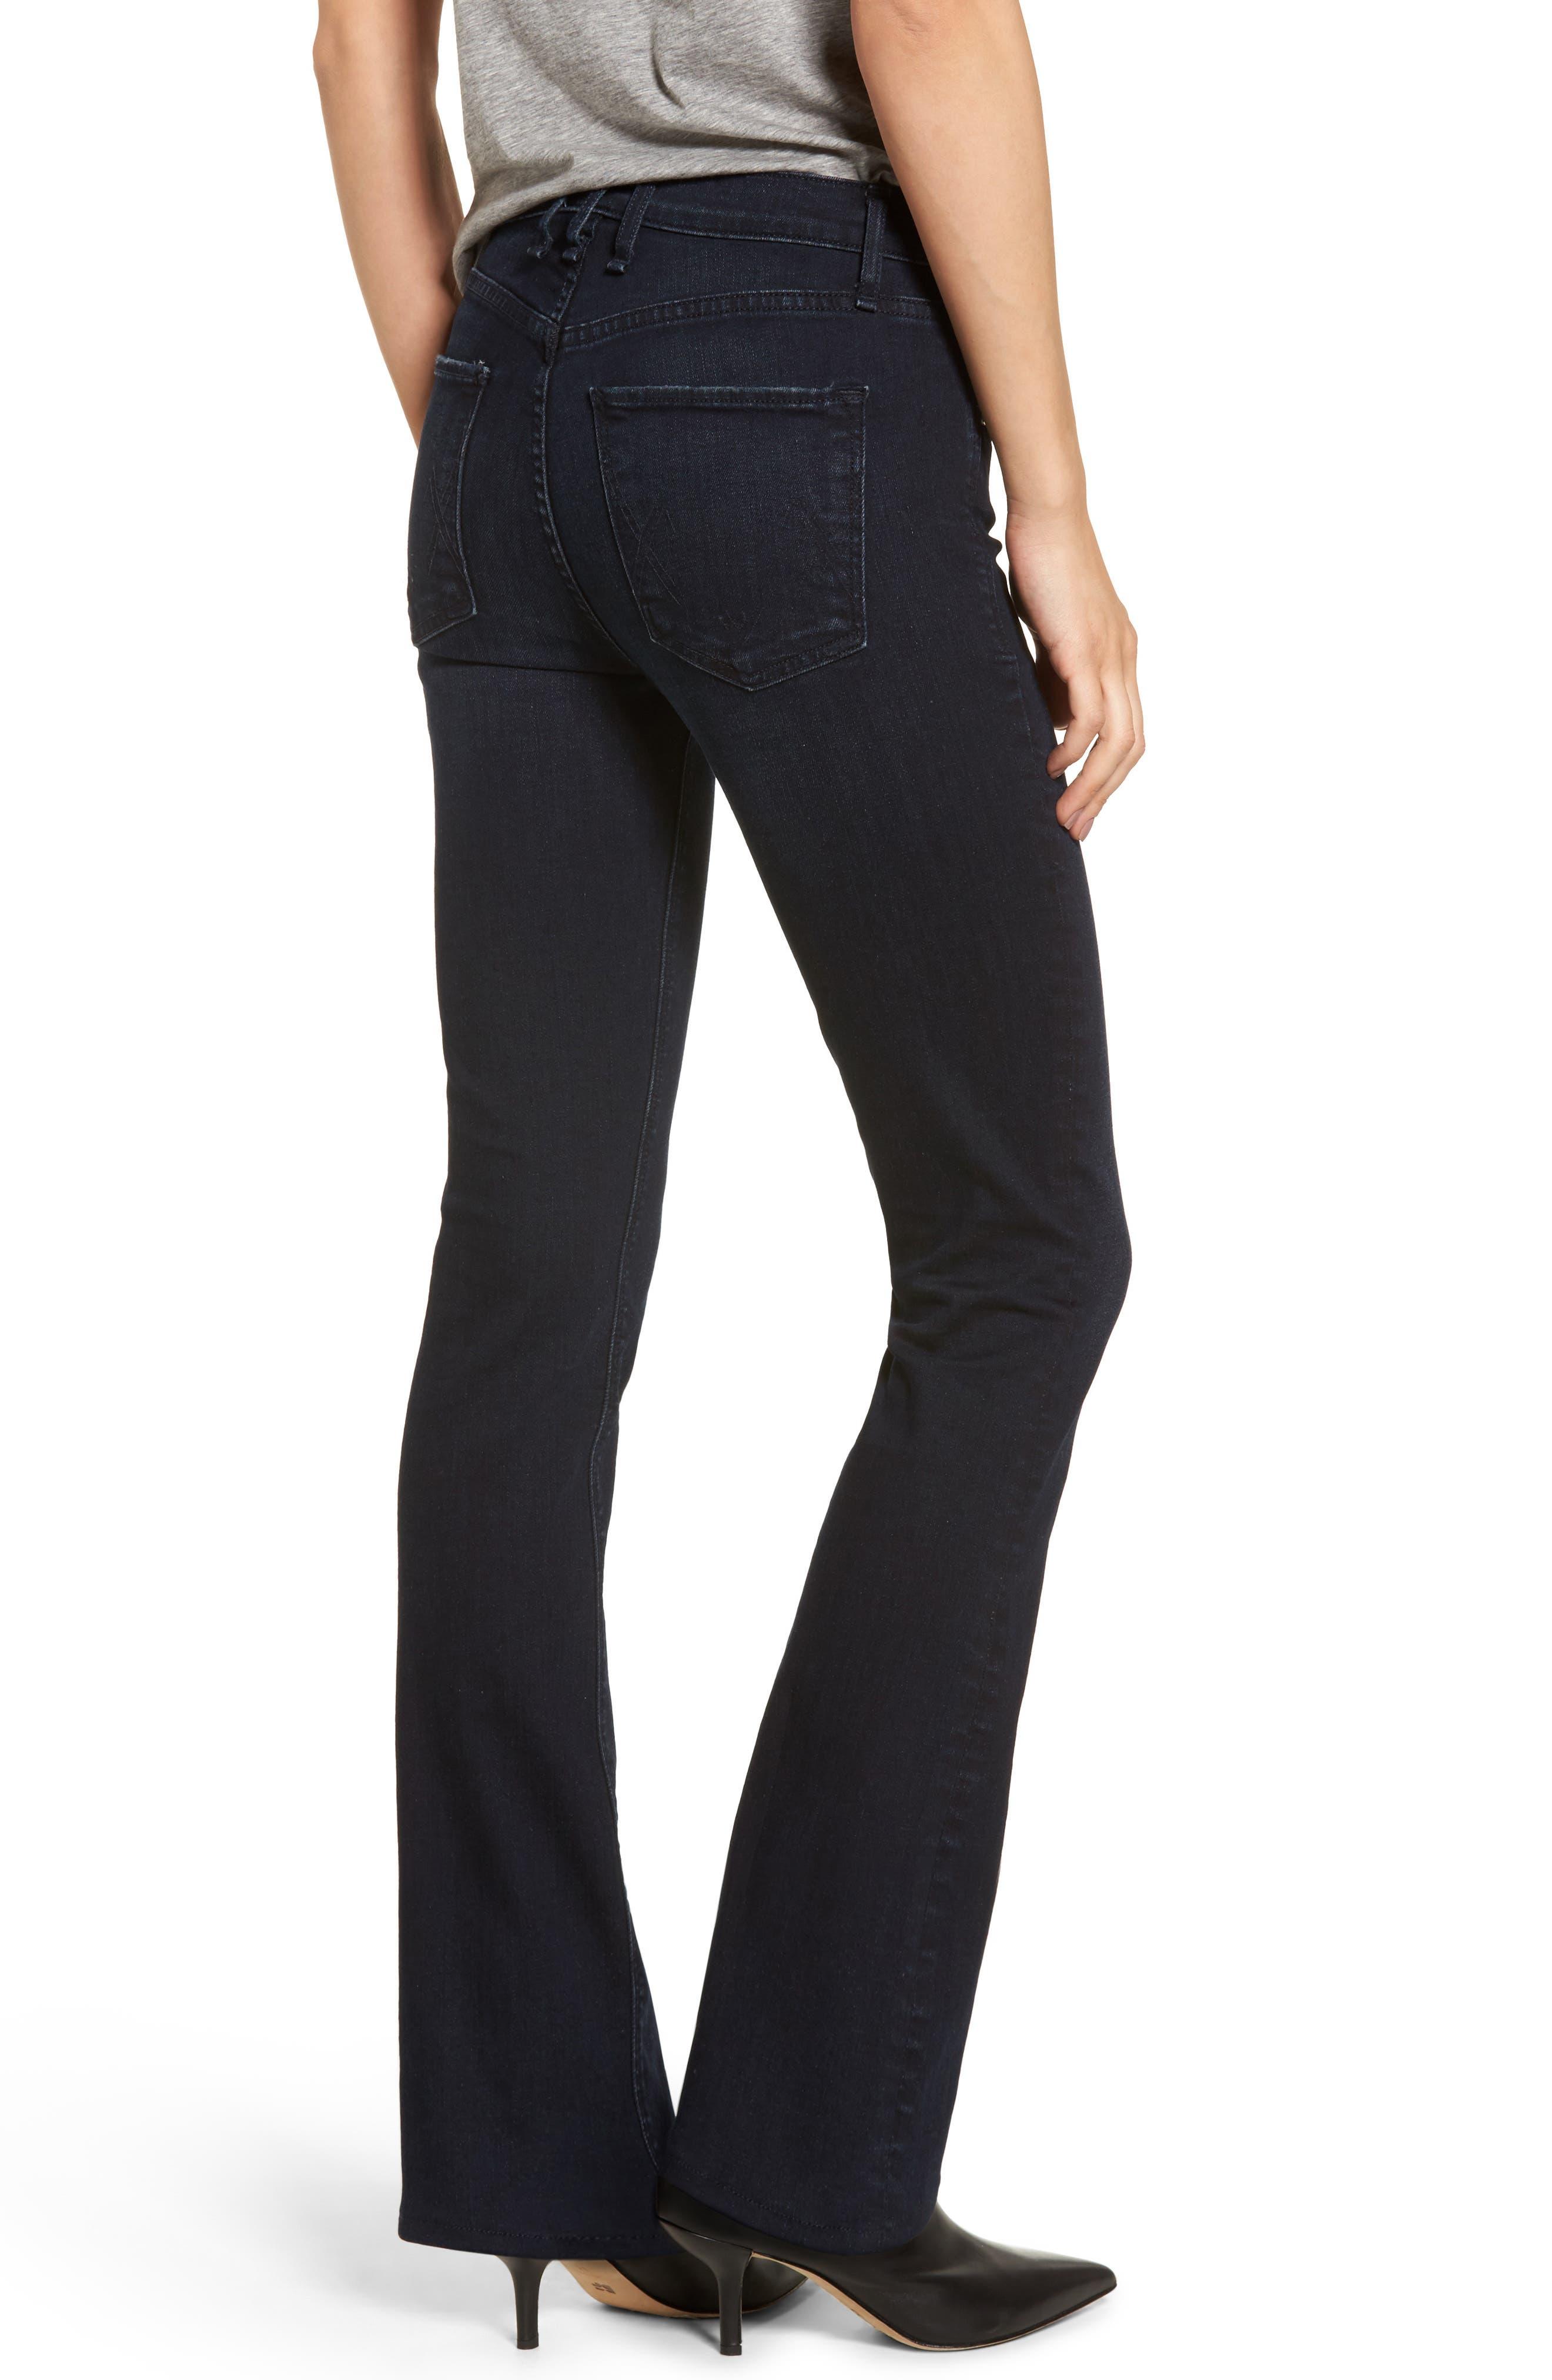 Alternate Image 2  - McGuire Gainsbourg Bootcut Jeans (Aja)